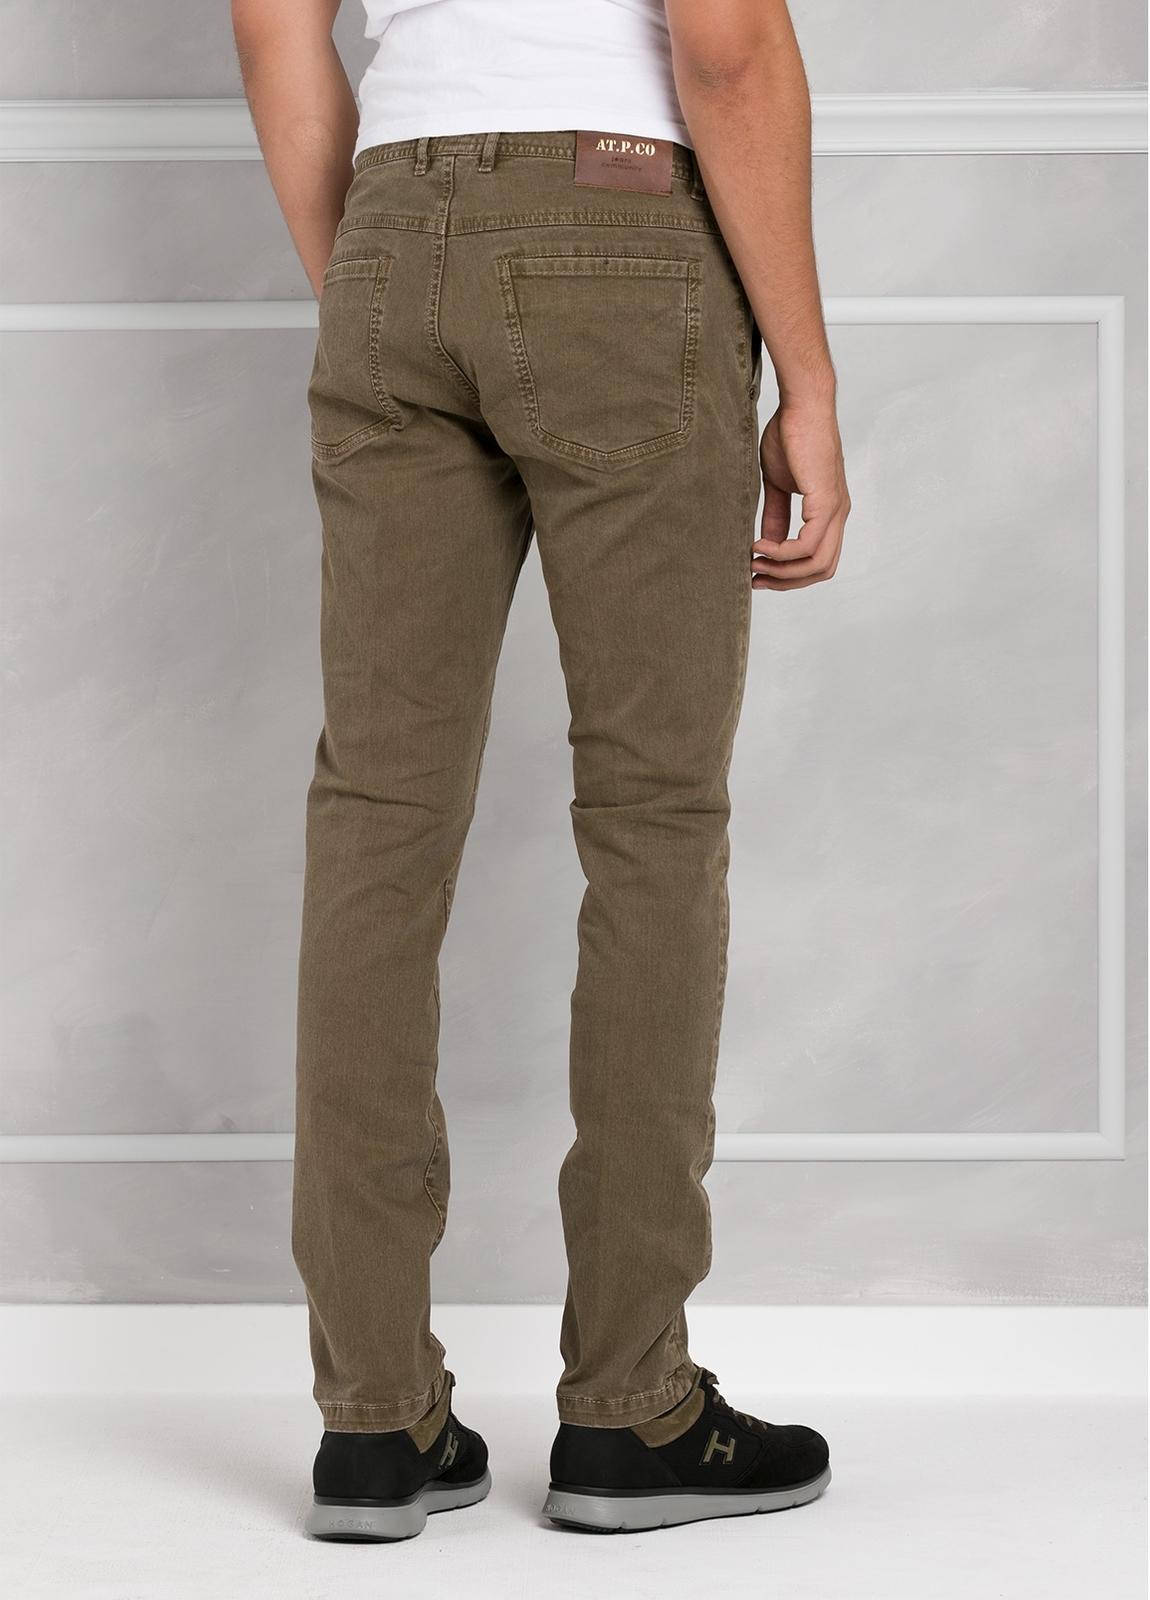 Pantalón 5 bolsillos modelo BRAD 01 color tostado. 97% Algodón 3% Elastán. - Ítem2